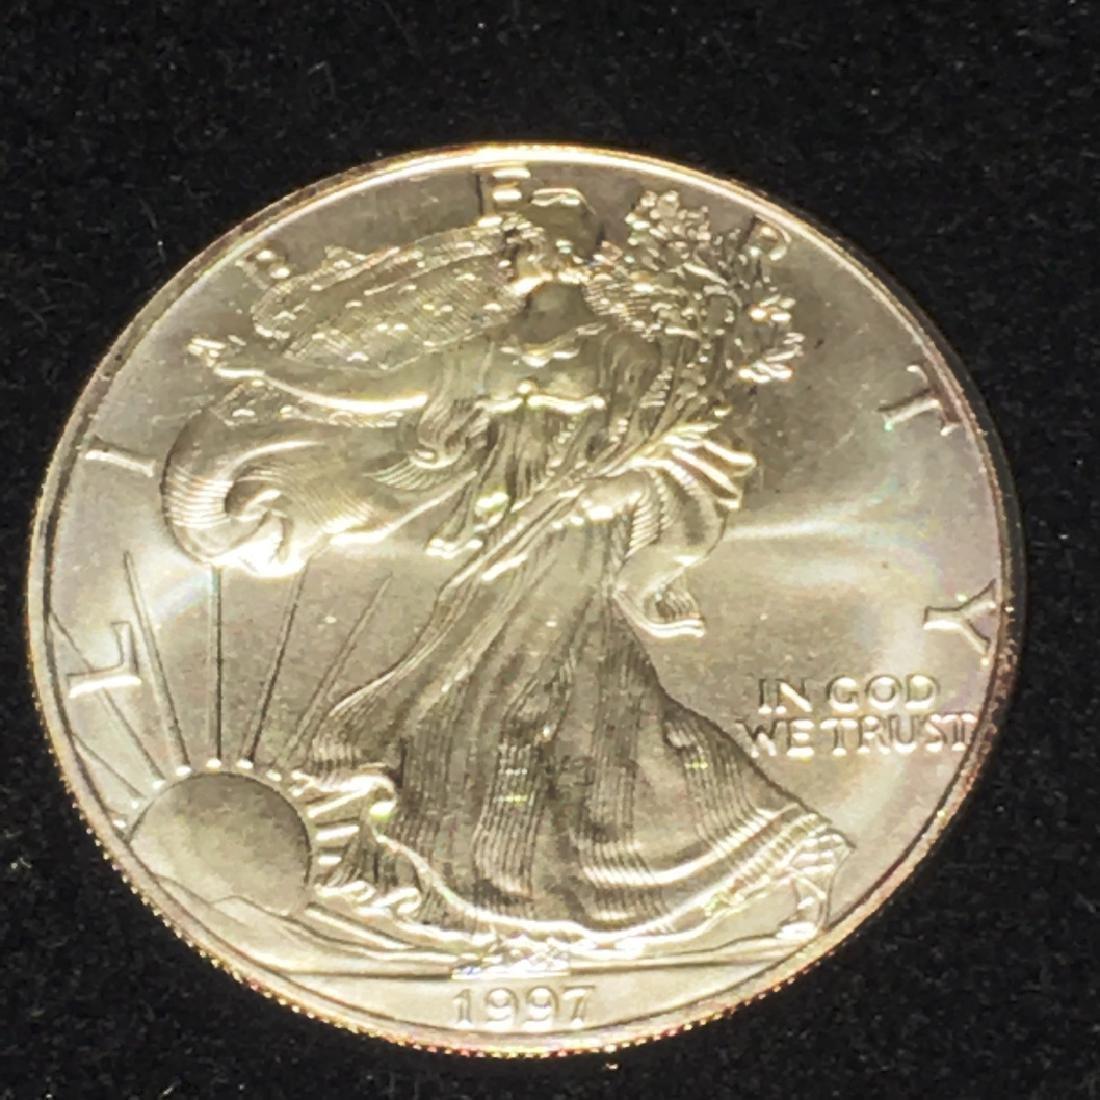 1997 SILVER EAGLE $1